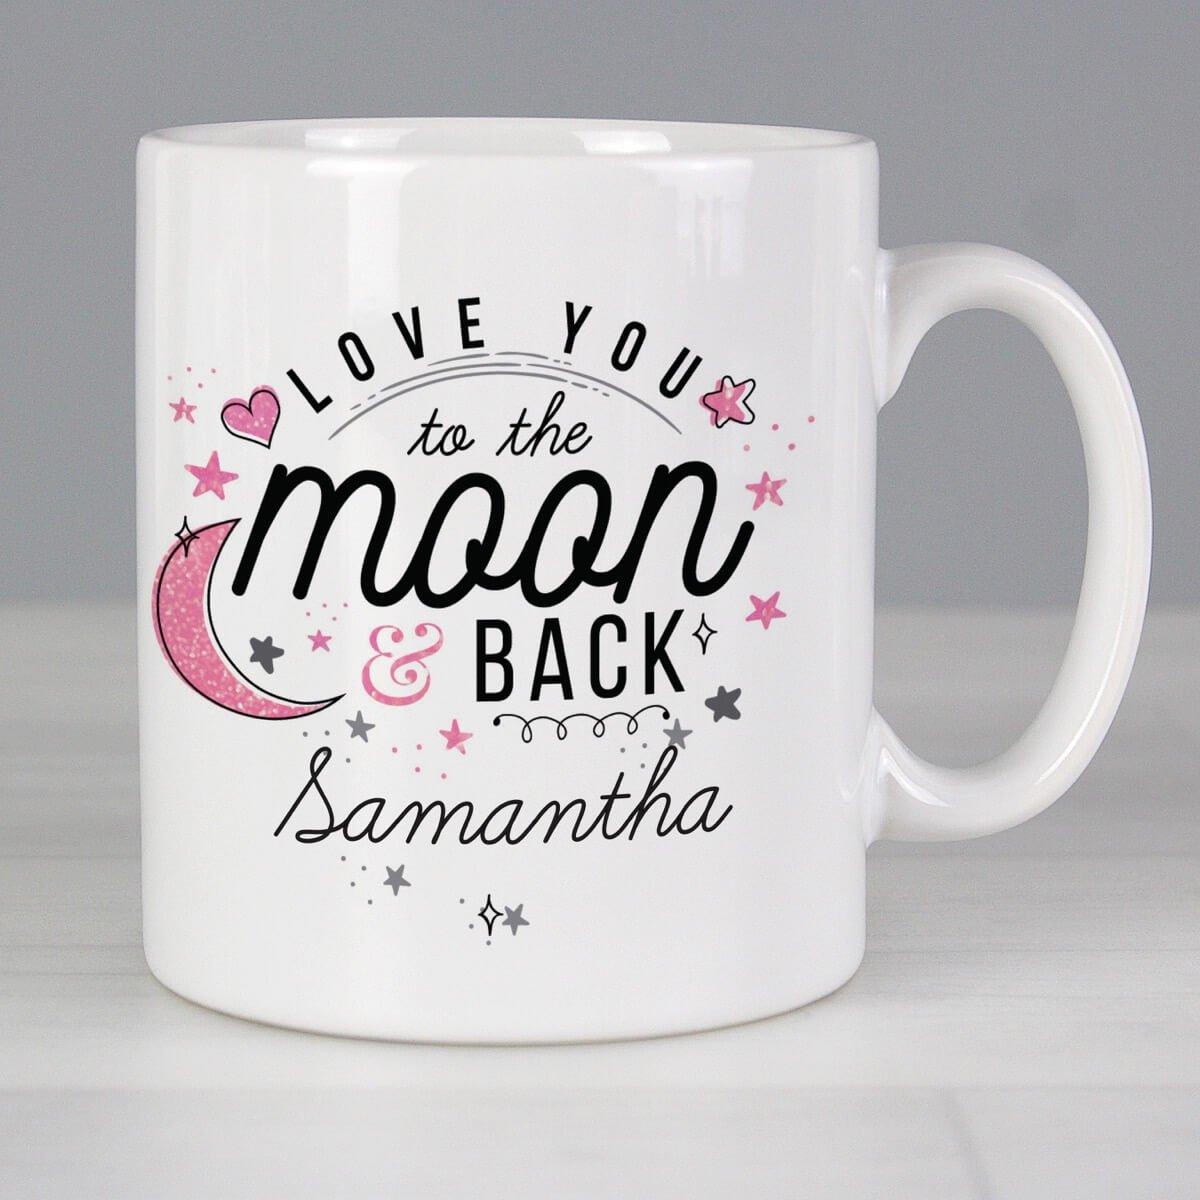 Personalised To The Moon & Back Pink Mug